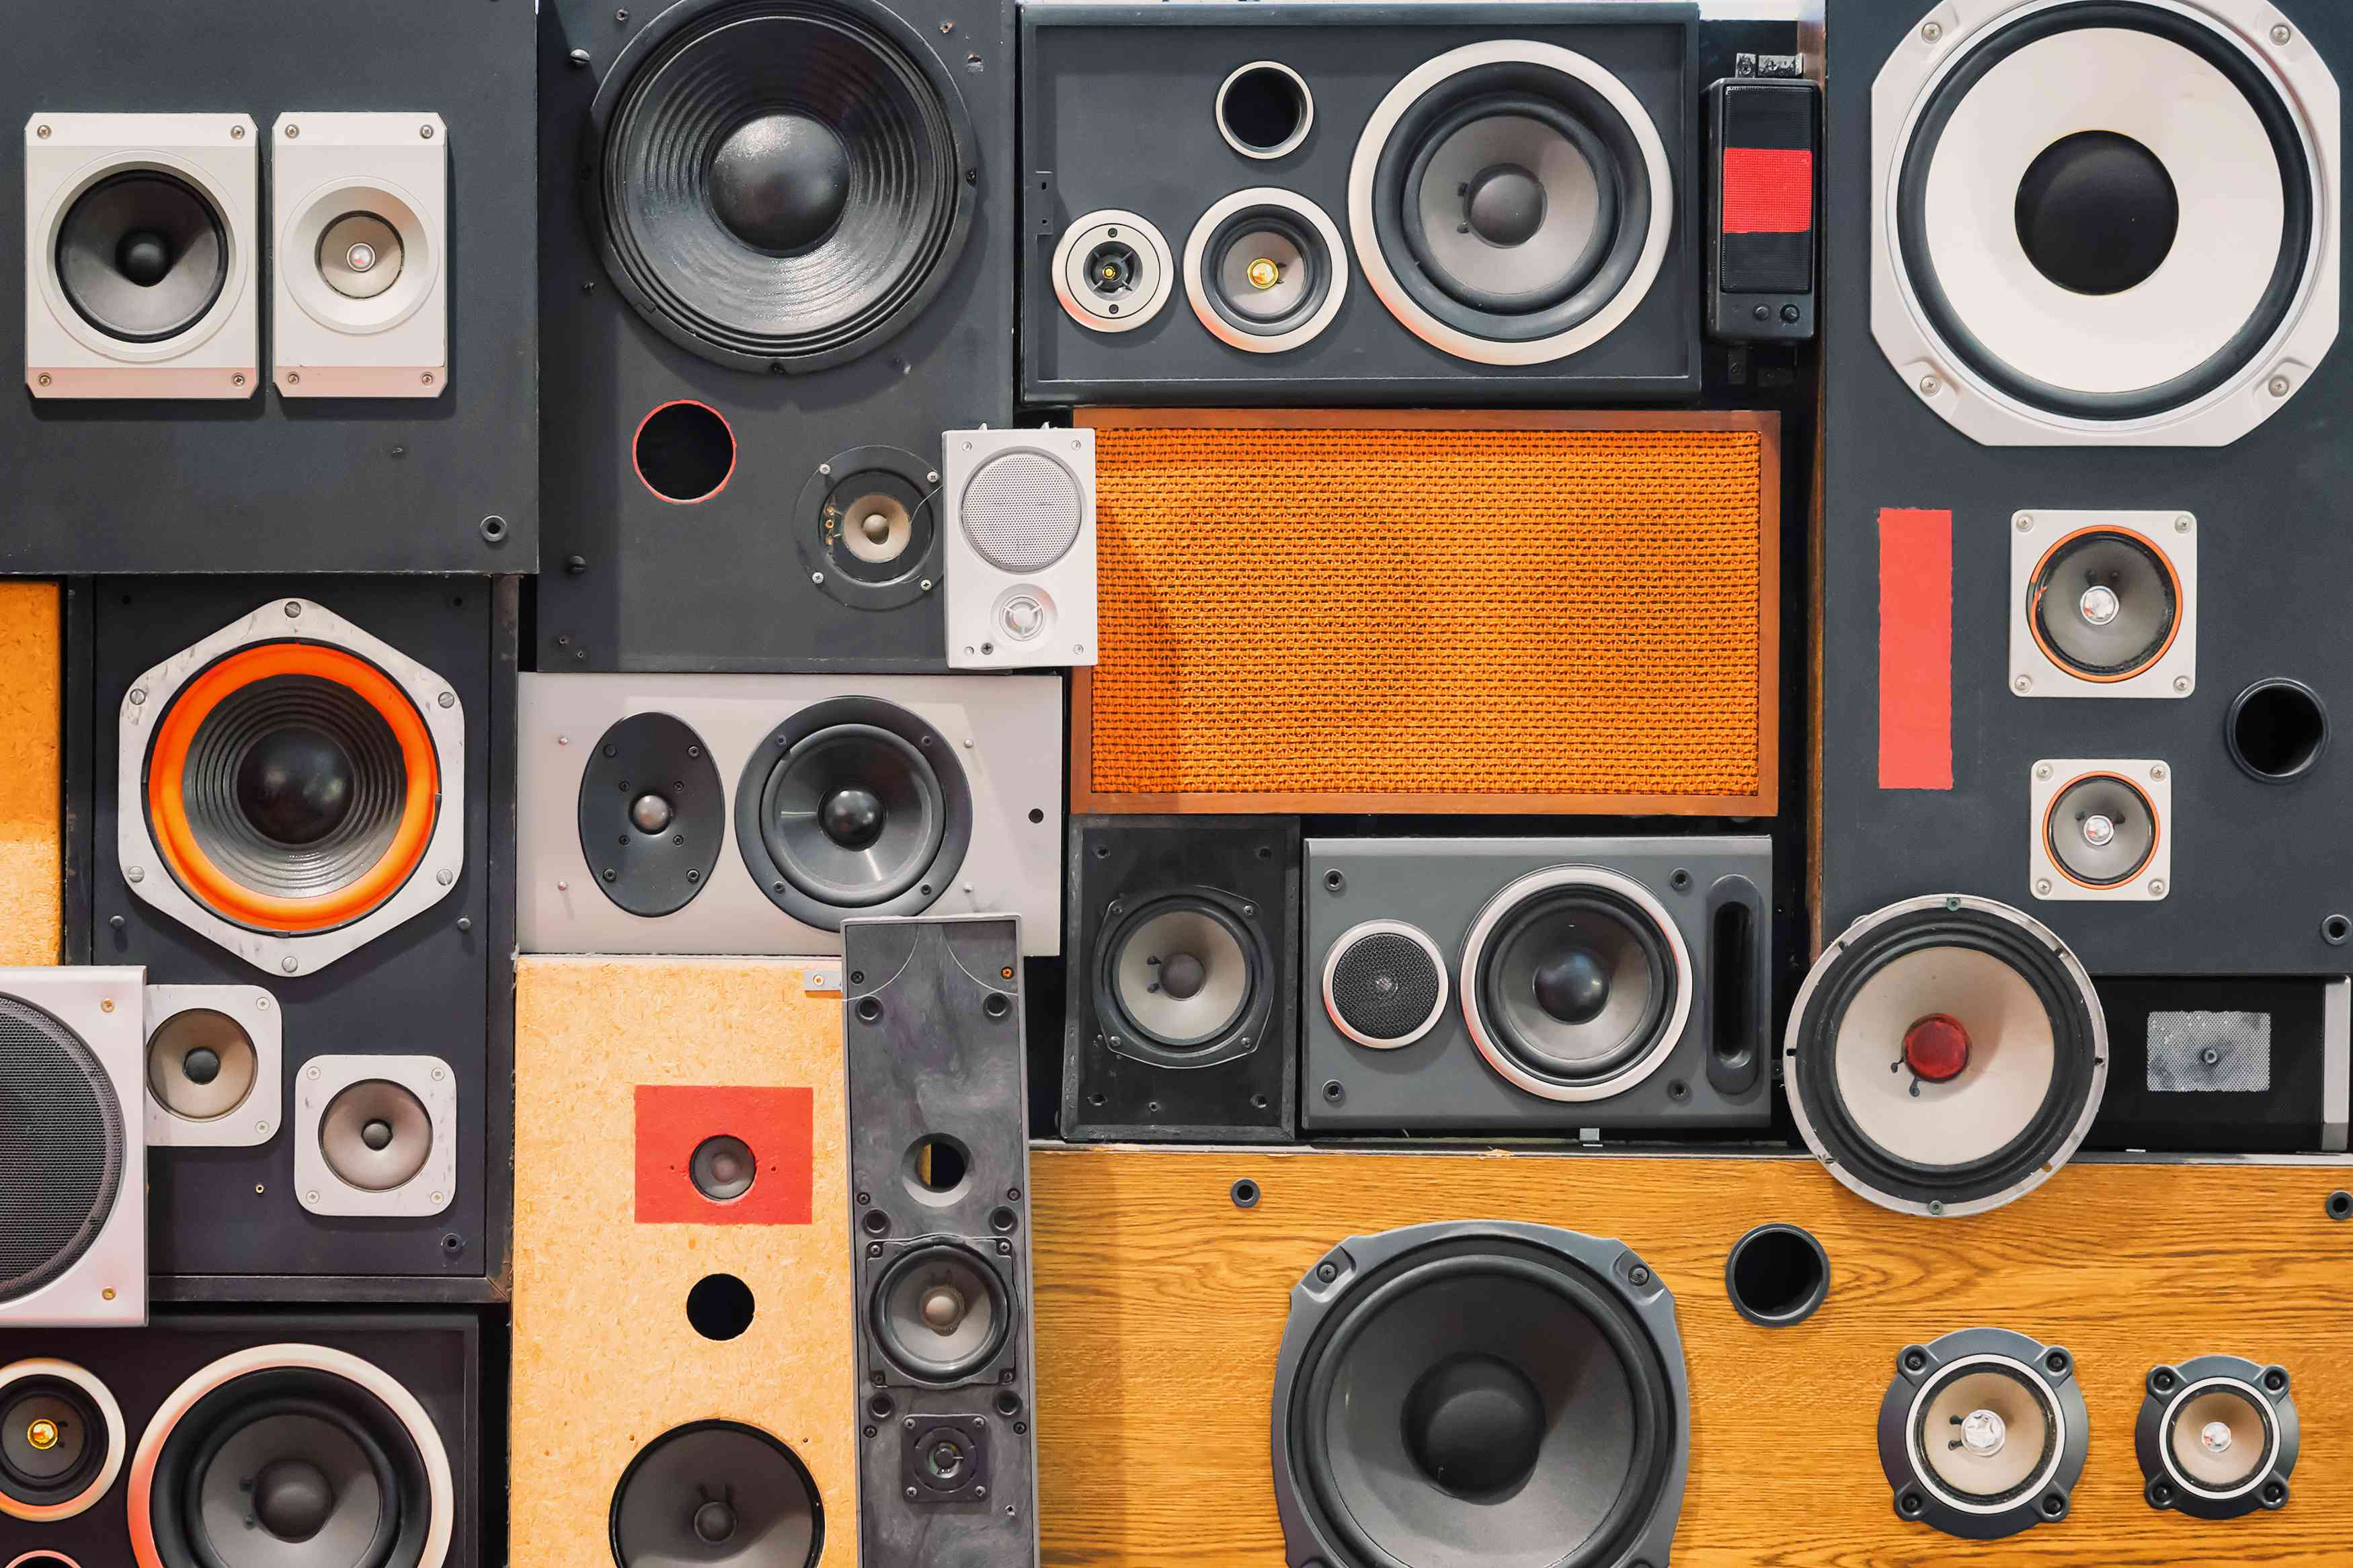 Retro speakers stacked like tetris.